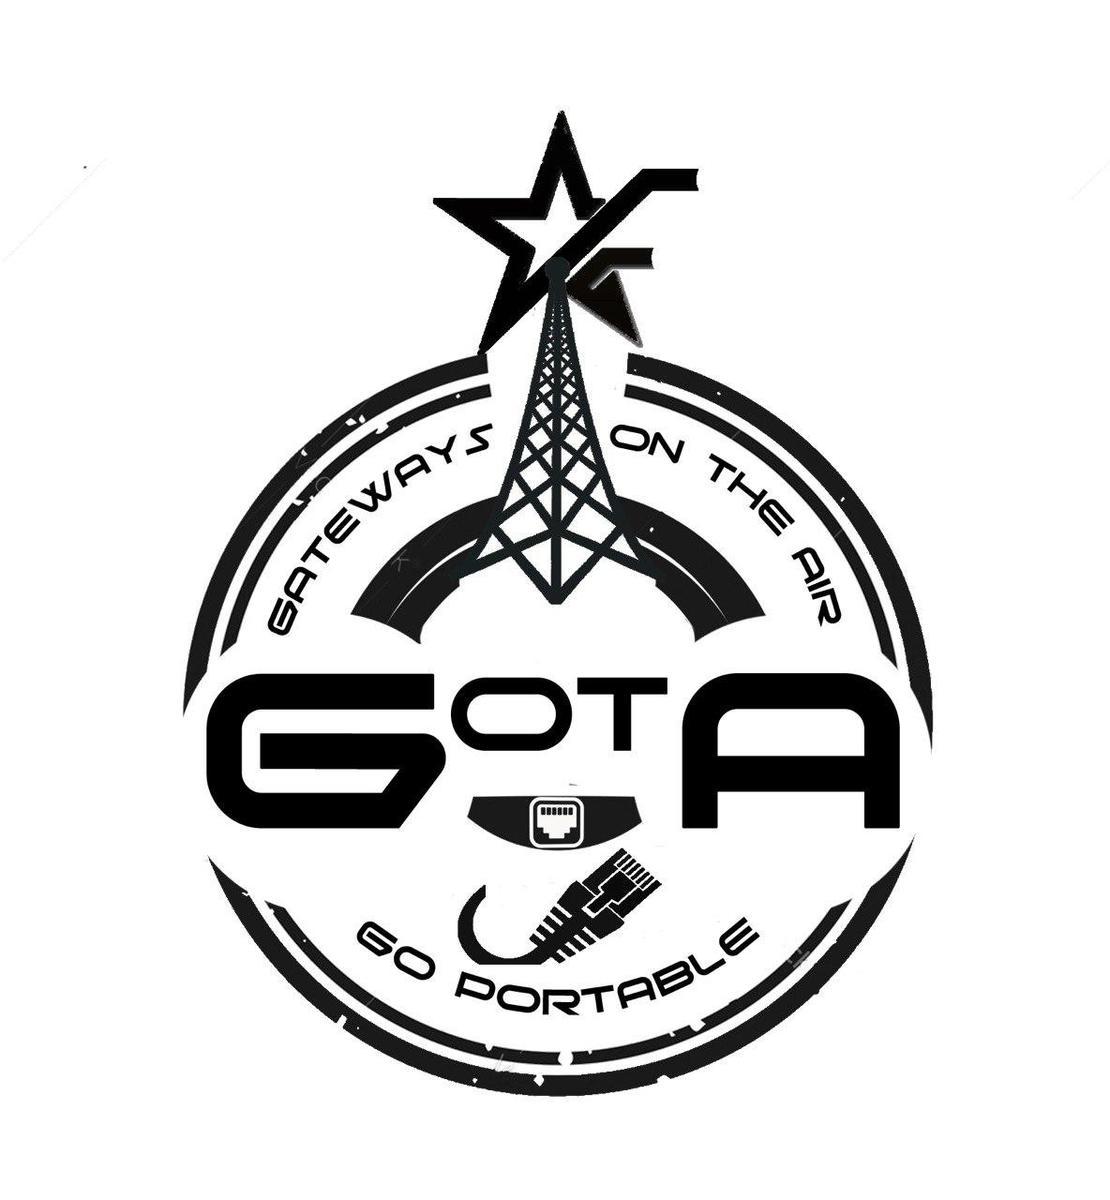 Primary Image for GB6OTA